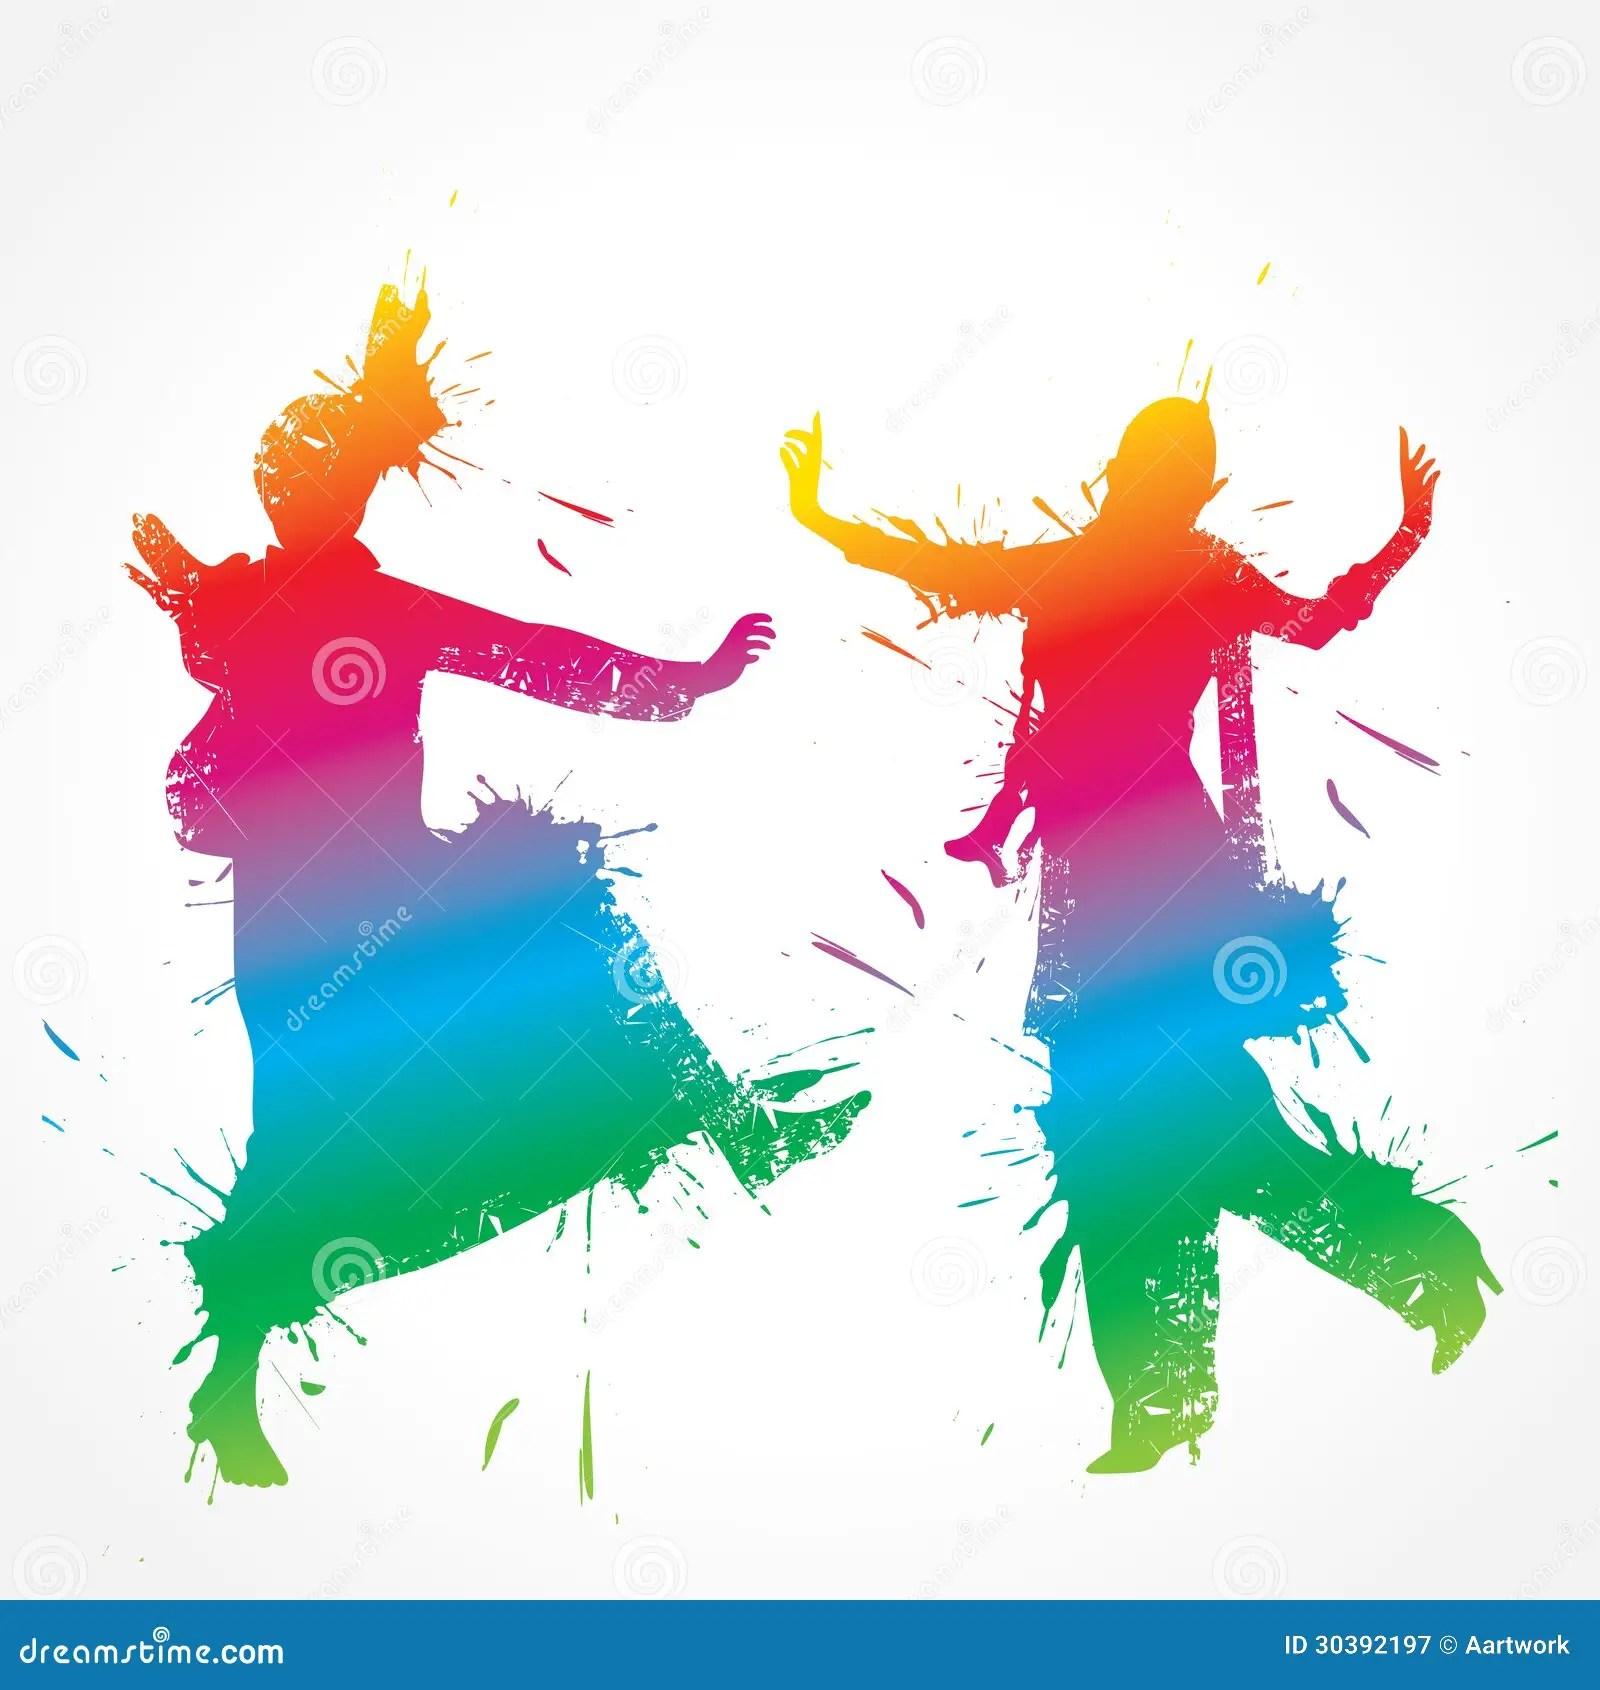 Punjabi Boy And Girl Wallpaper Colorful Bhangra And Gidda Dancer Stock Vector Image